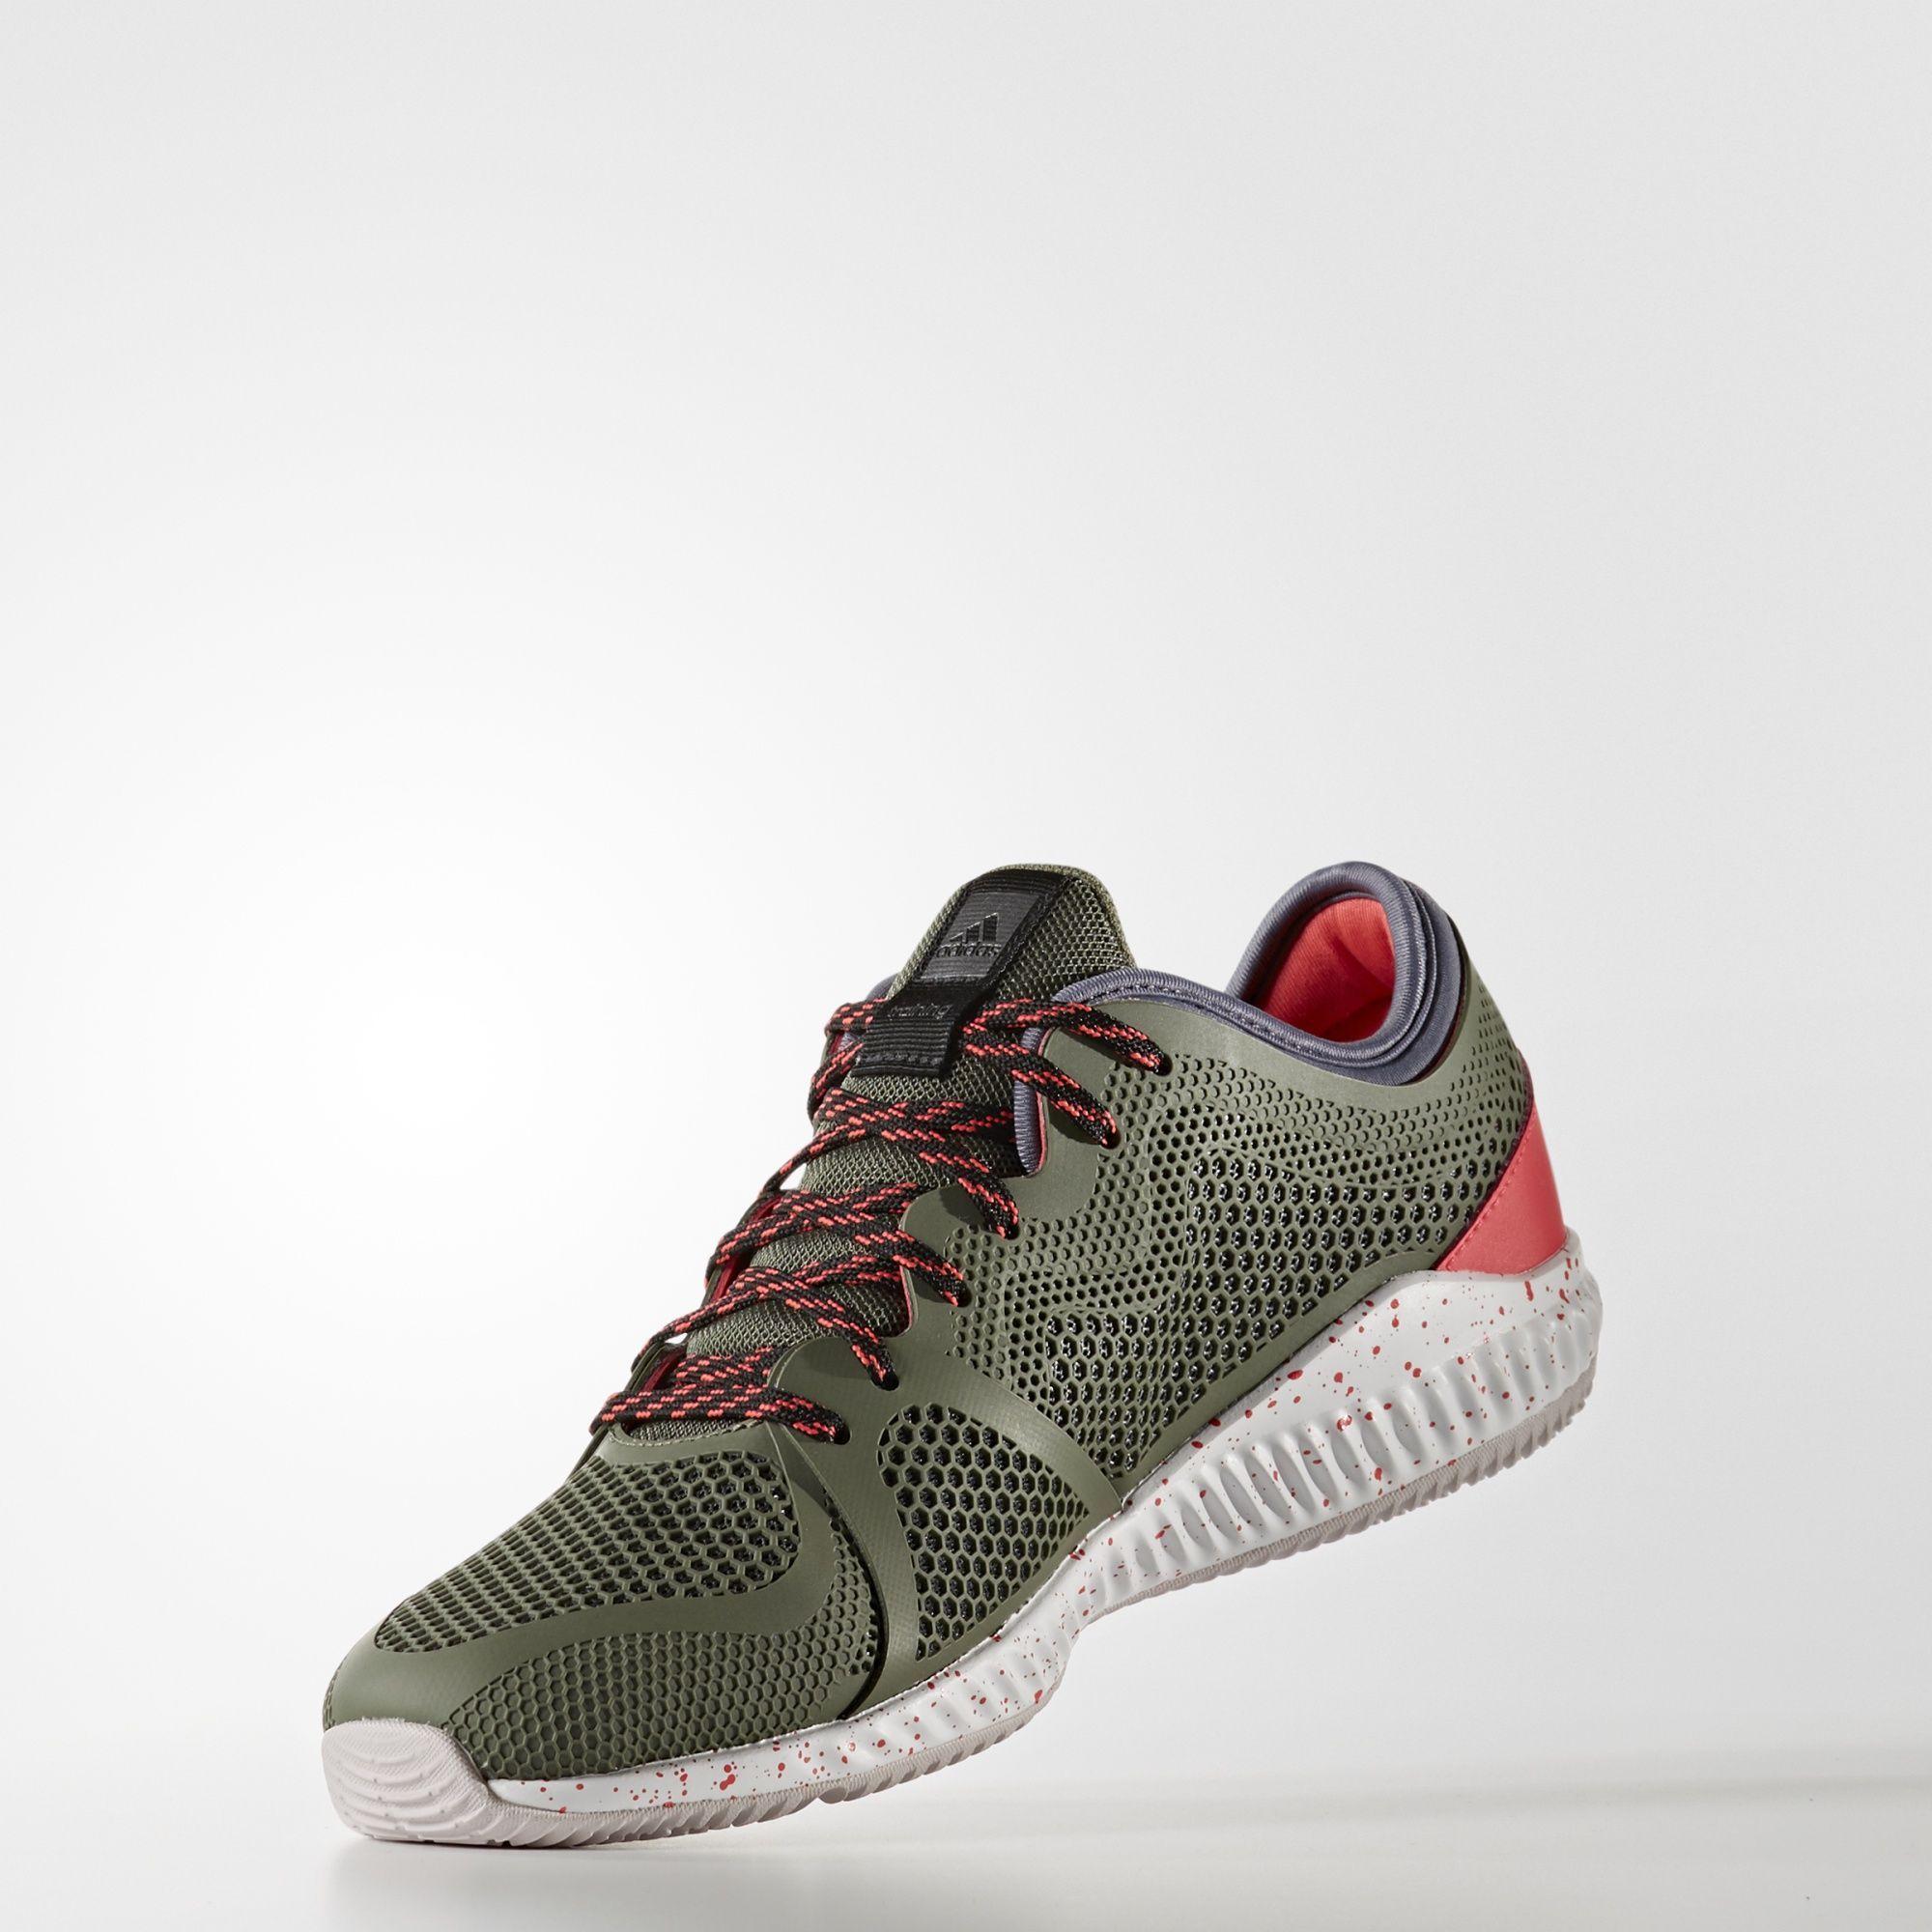 De Training Zapatillas BounceSneakers Adidas Crazymove CWxordBe